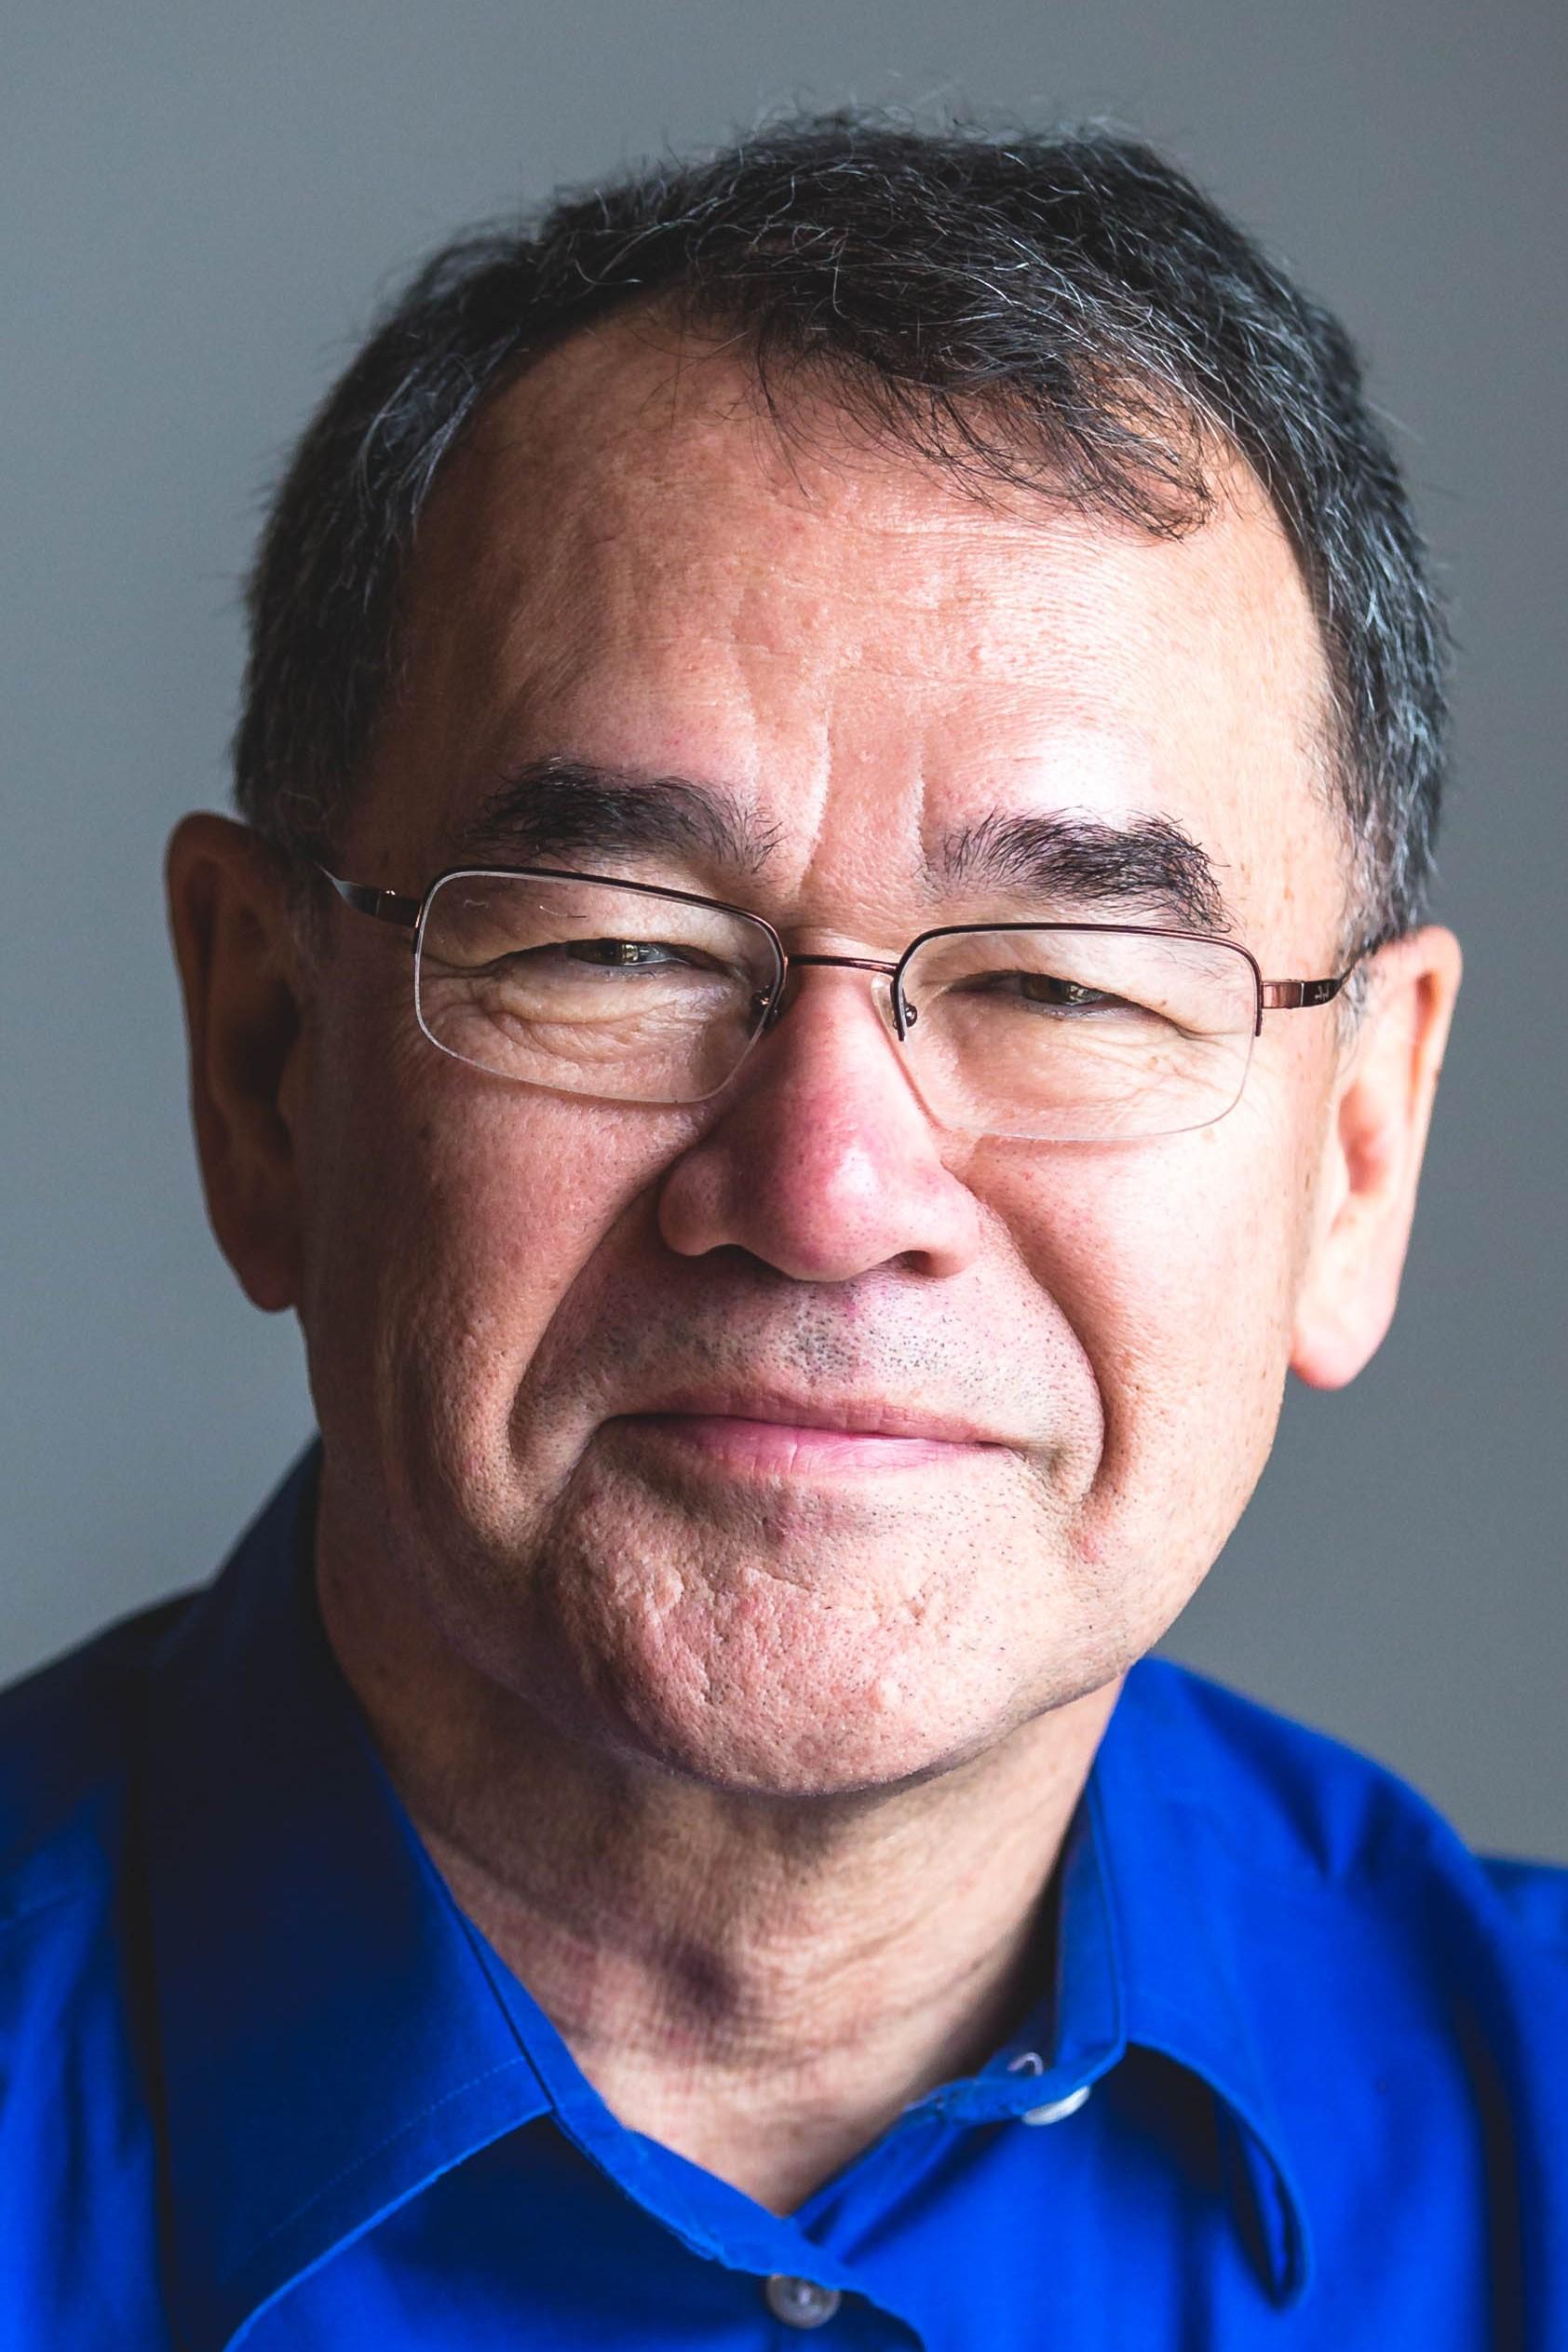 *Murray Armstrong Reg. Clinical Social Worker Armstrongs' Counselling  armstrongscounselling.com  10027 – 166 Street Edmonton T5P 4Y1 780 – 444 - 4399  dmarm@telus.net  Focus: Men's Issues, Trauma